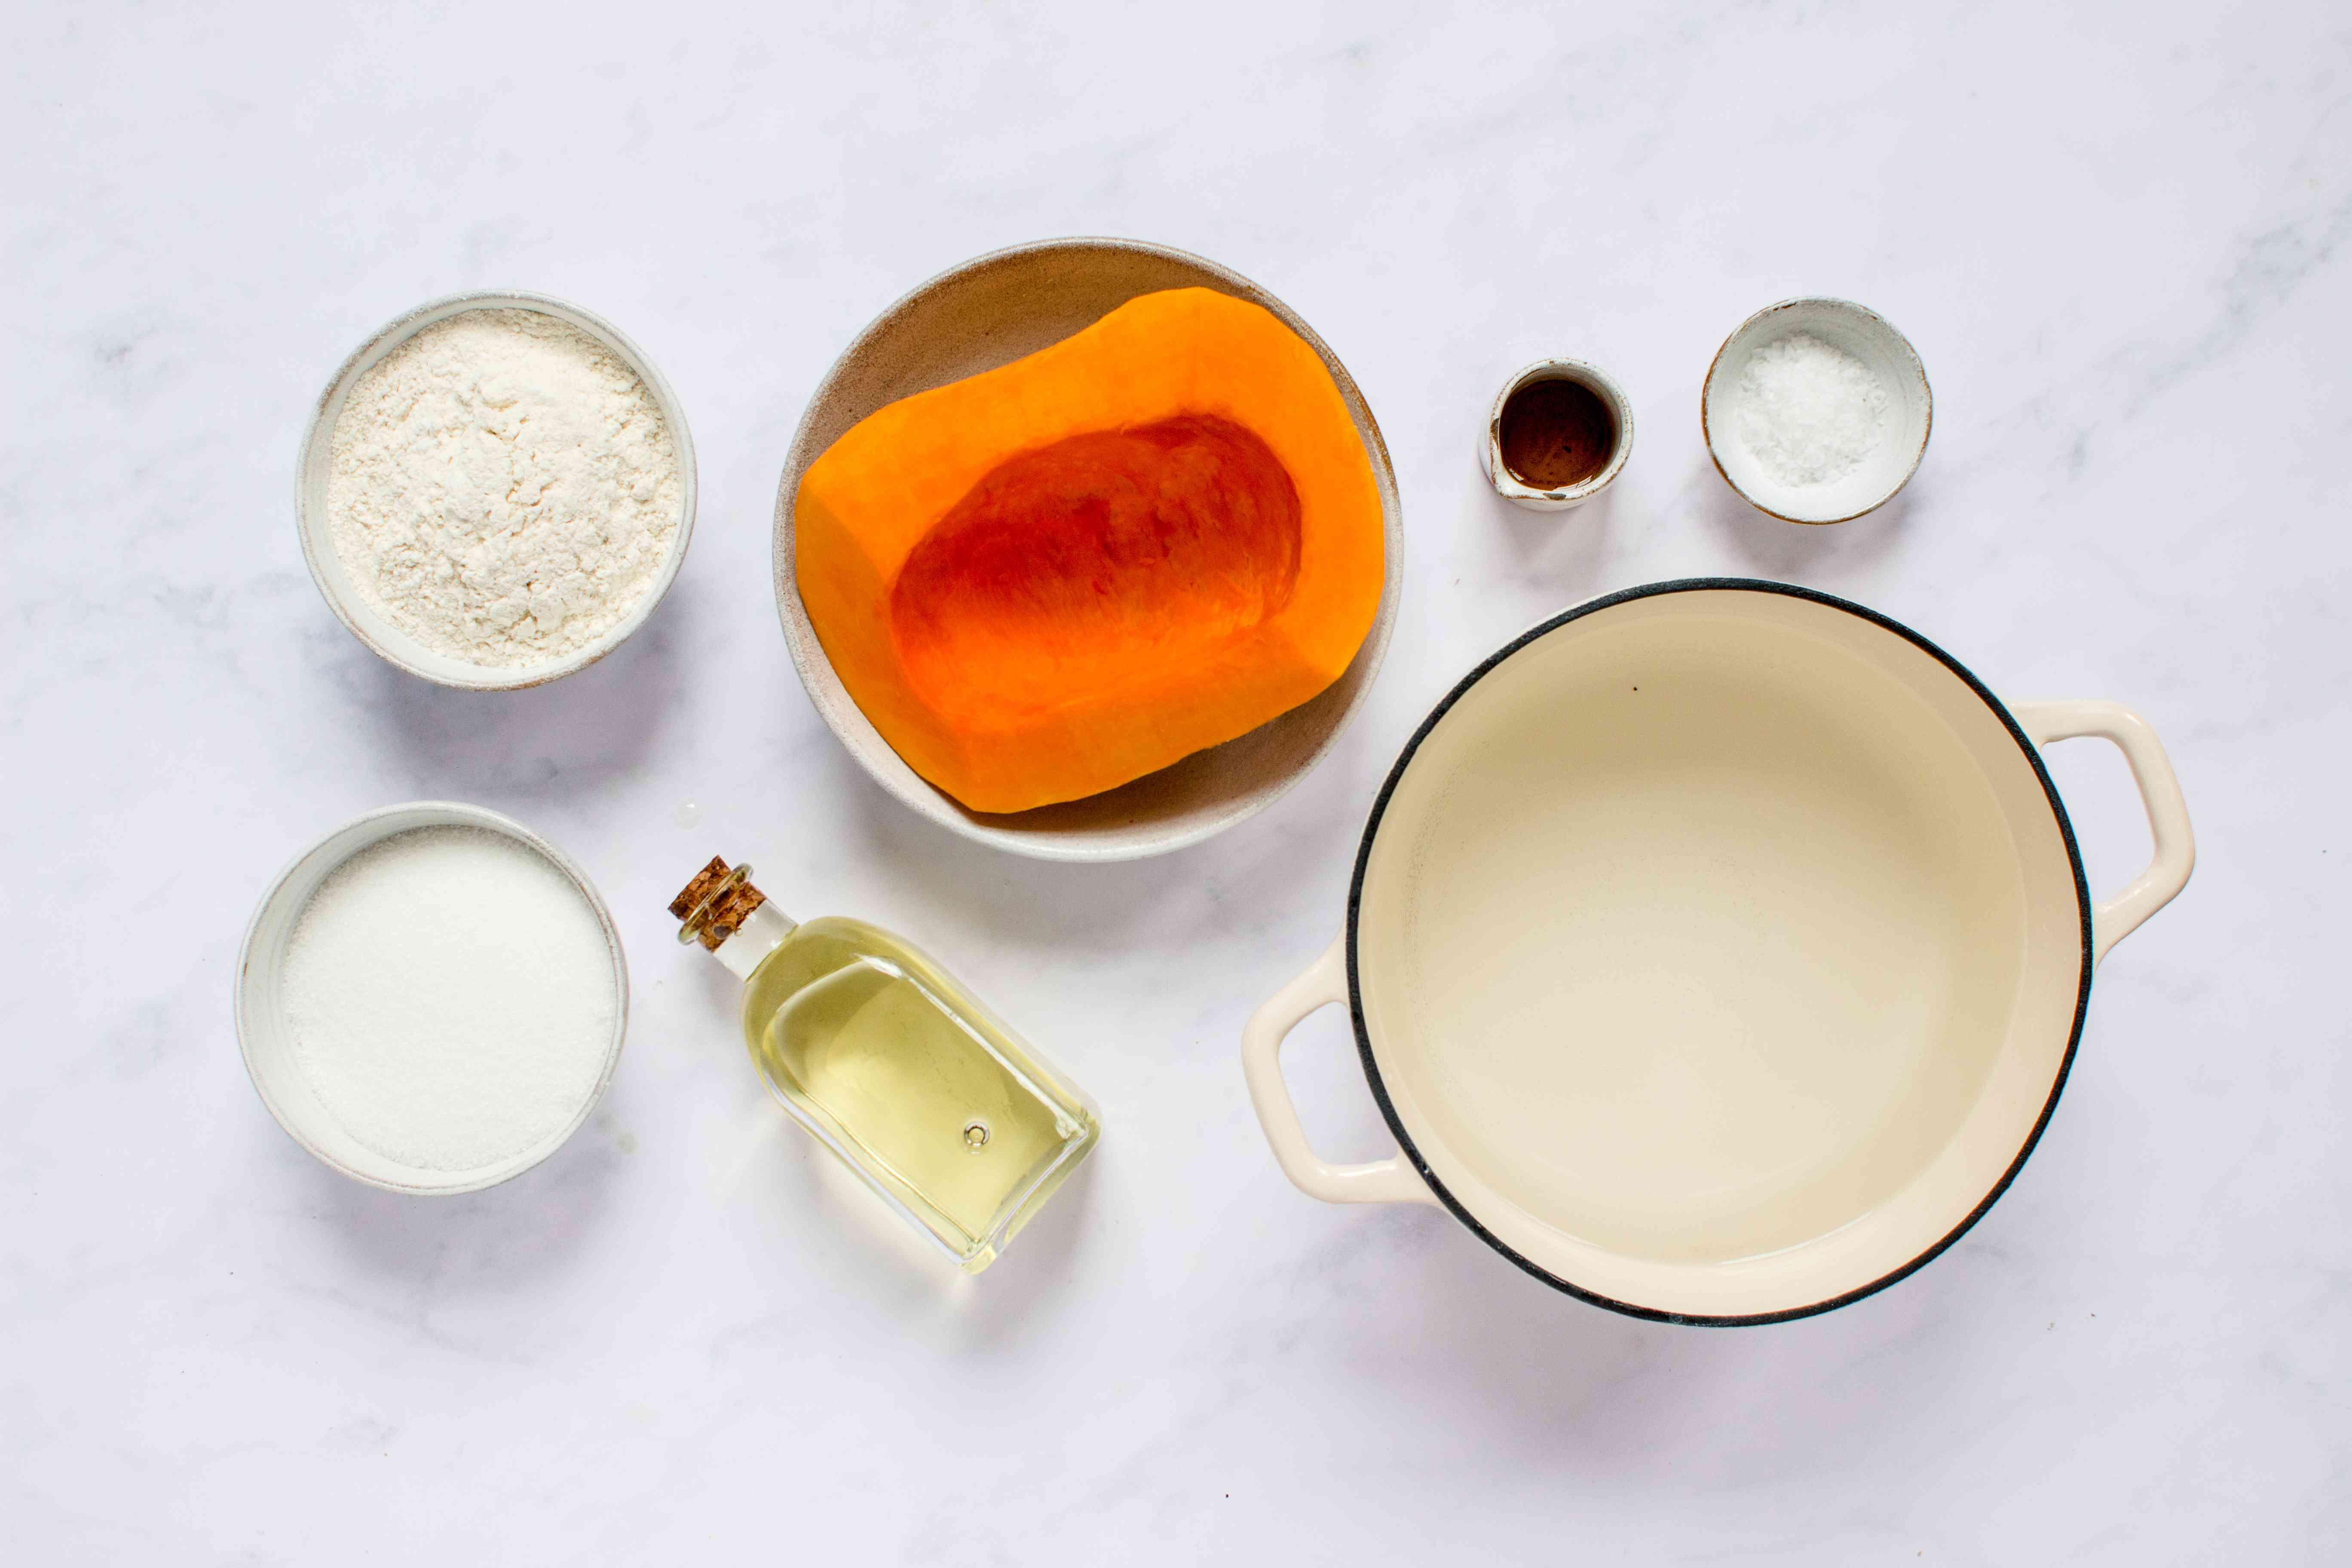 West Indian Pumpkin Fritters (Frituras de Calabaza) ingredients